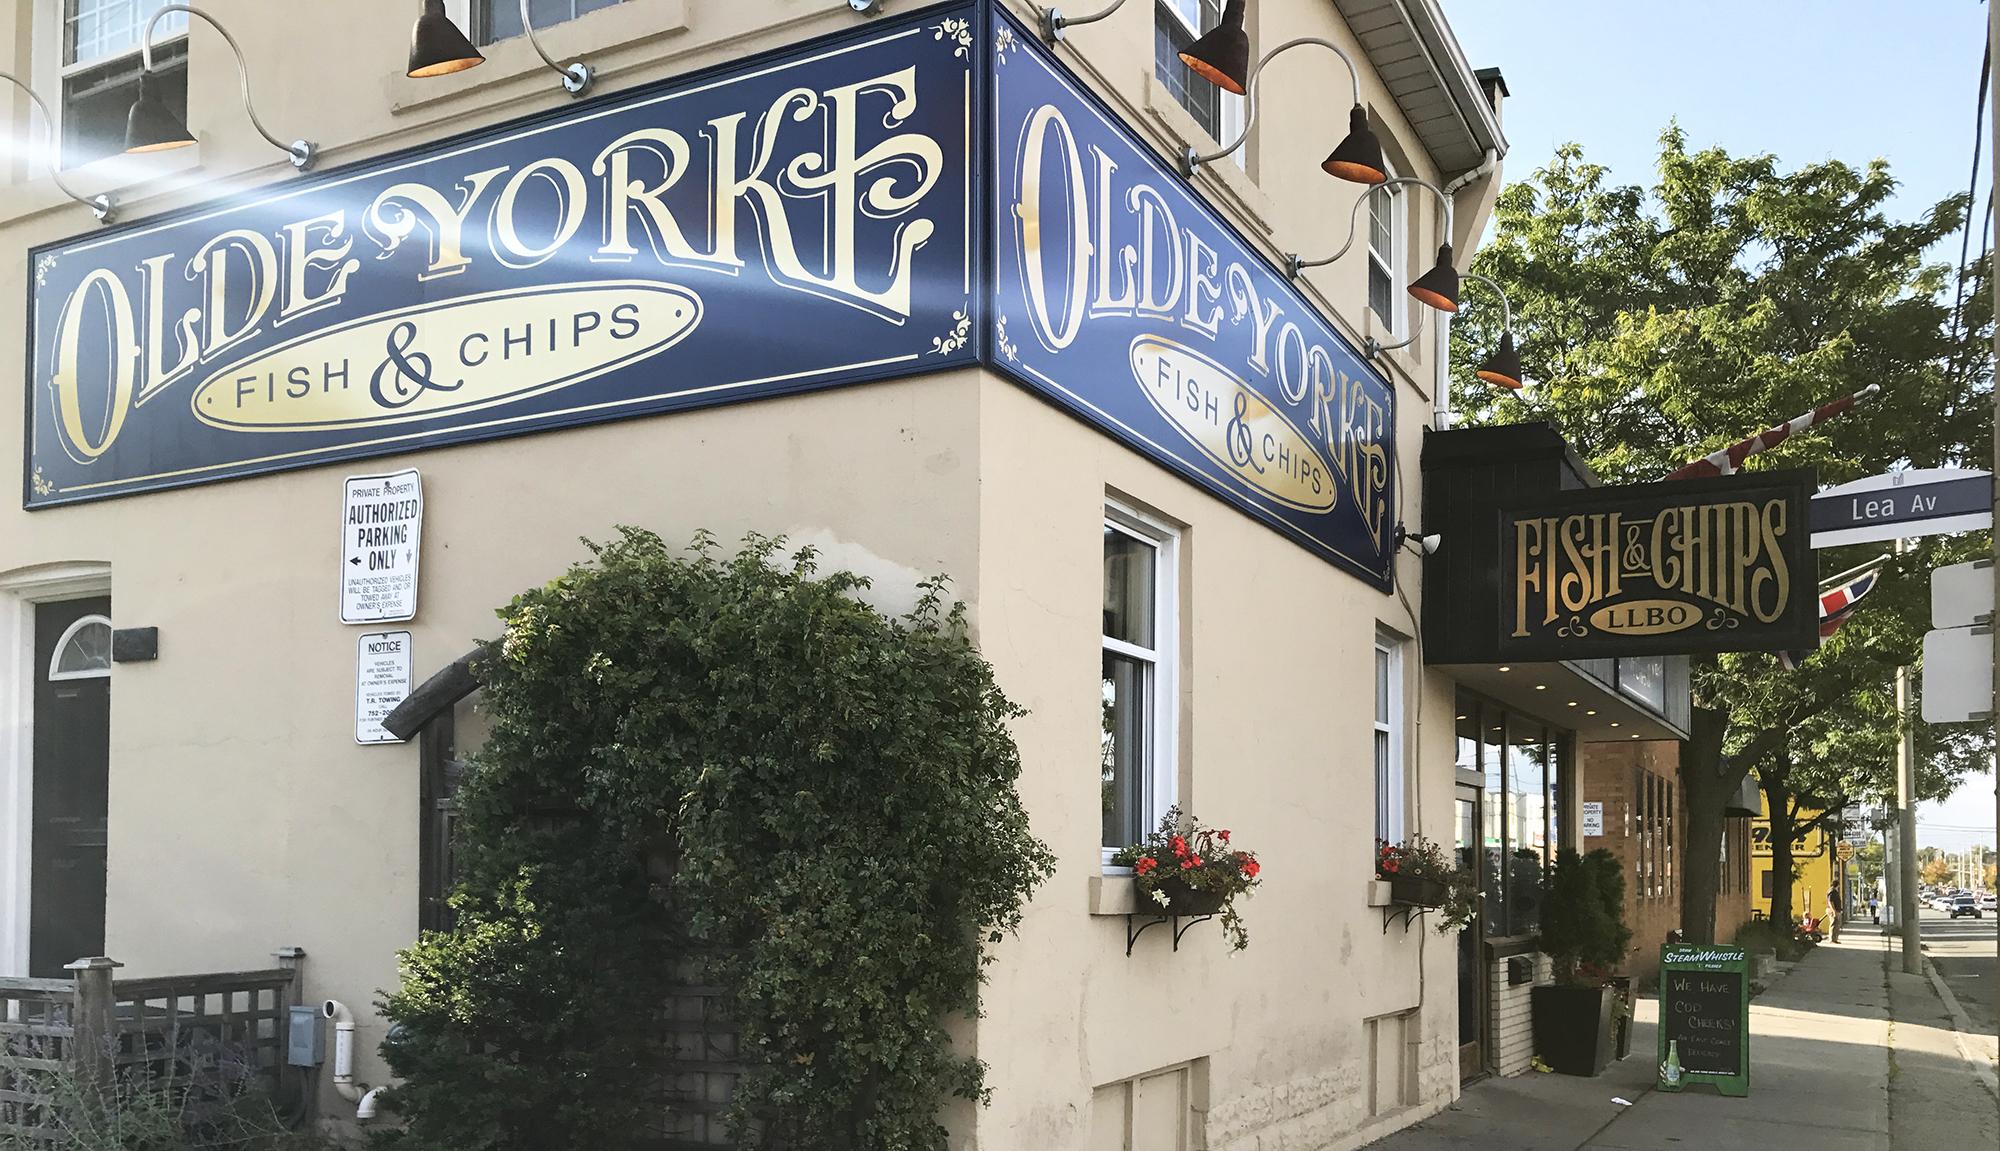 Olde Yorke Fish & Chips - Exterior Signage